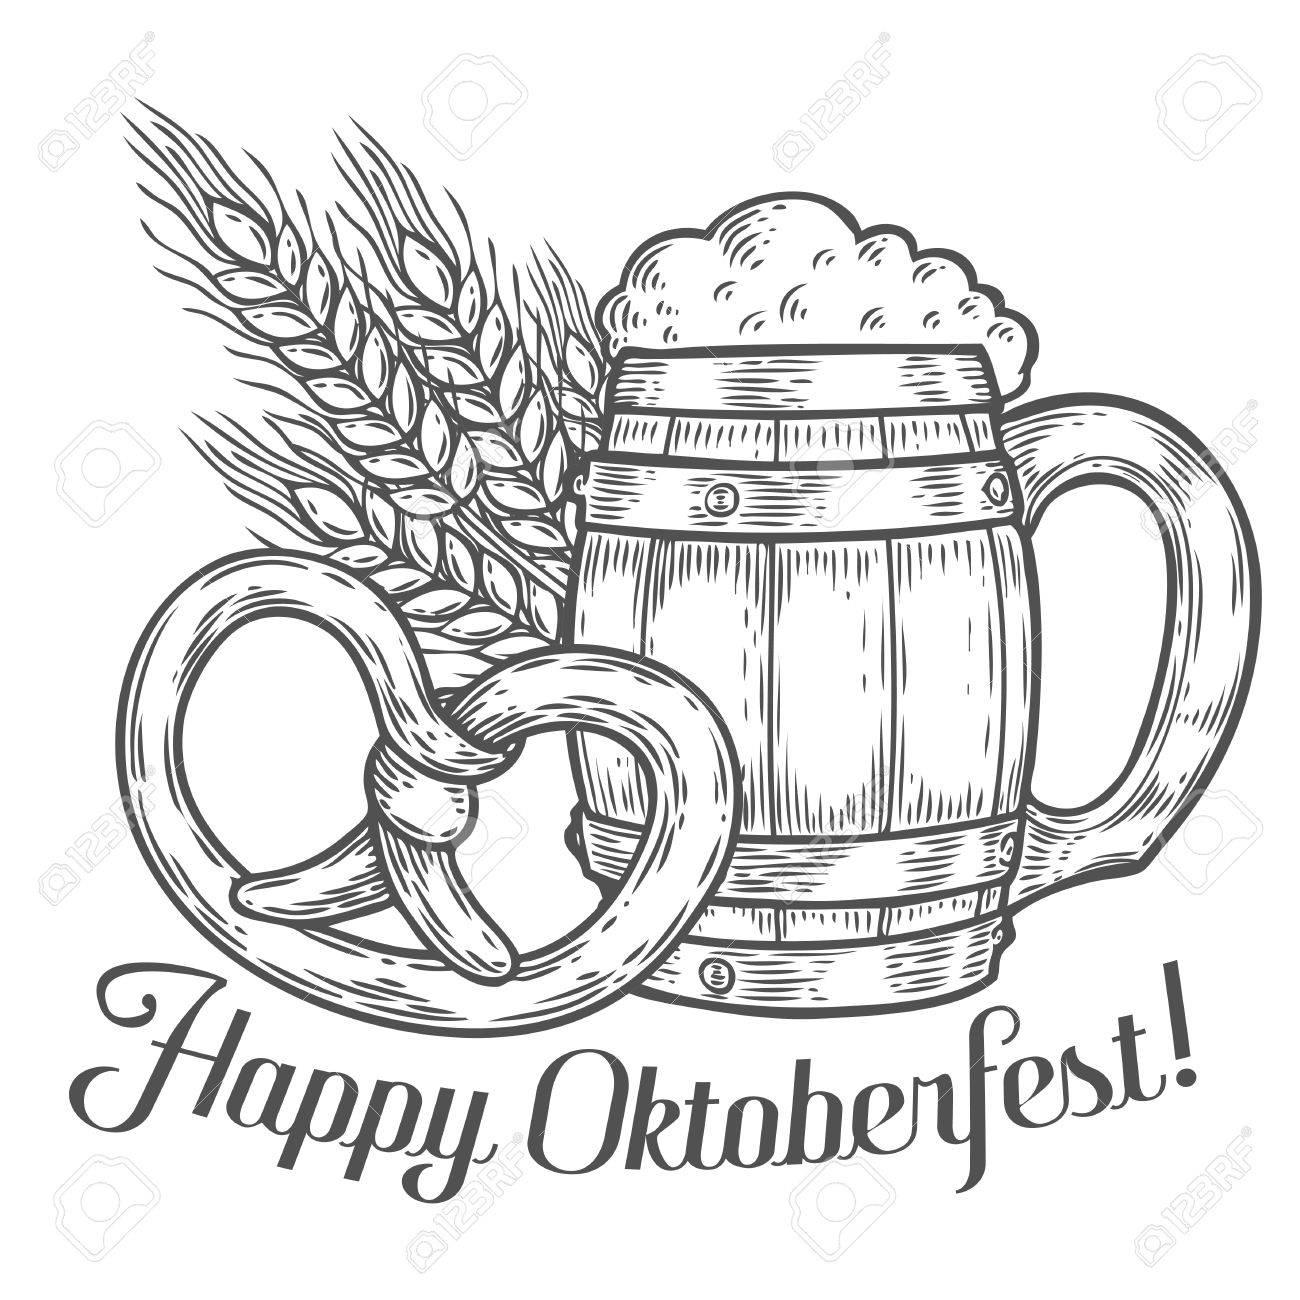 1300x1300 Wooden Craft Beer Mug, Pretzel, Wheat. Happy Oktoberfest. Black